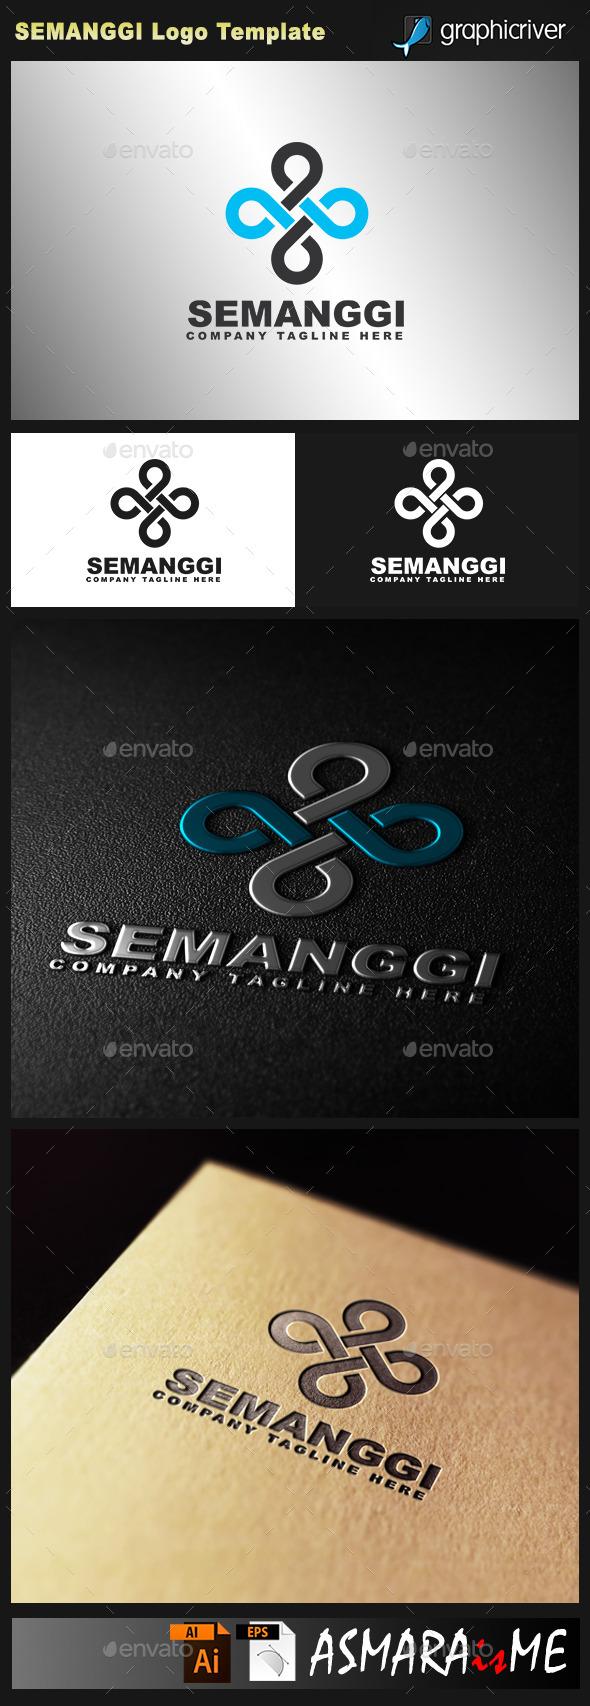 GraphicRiver Semanggi Infinity 69 Logo 10729936